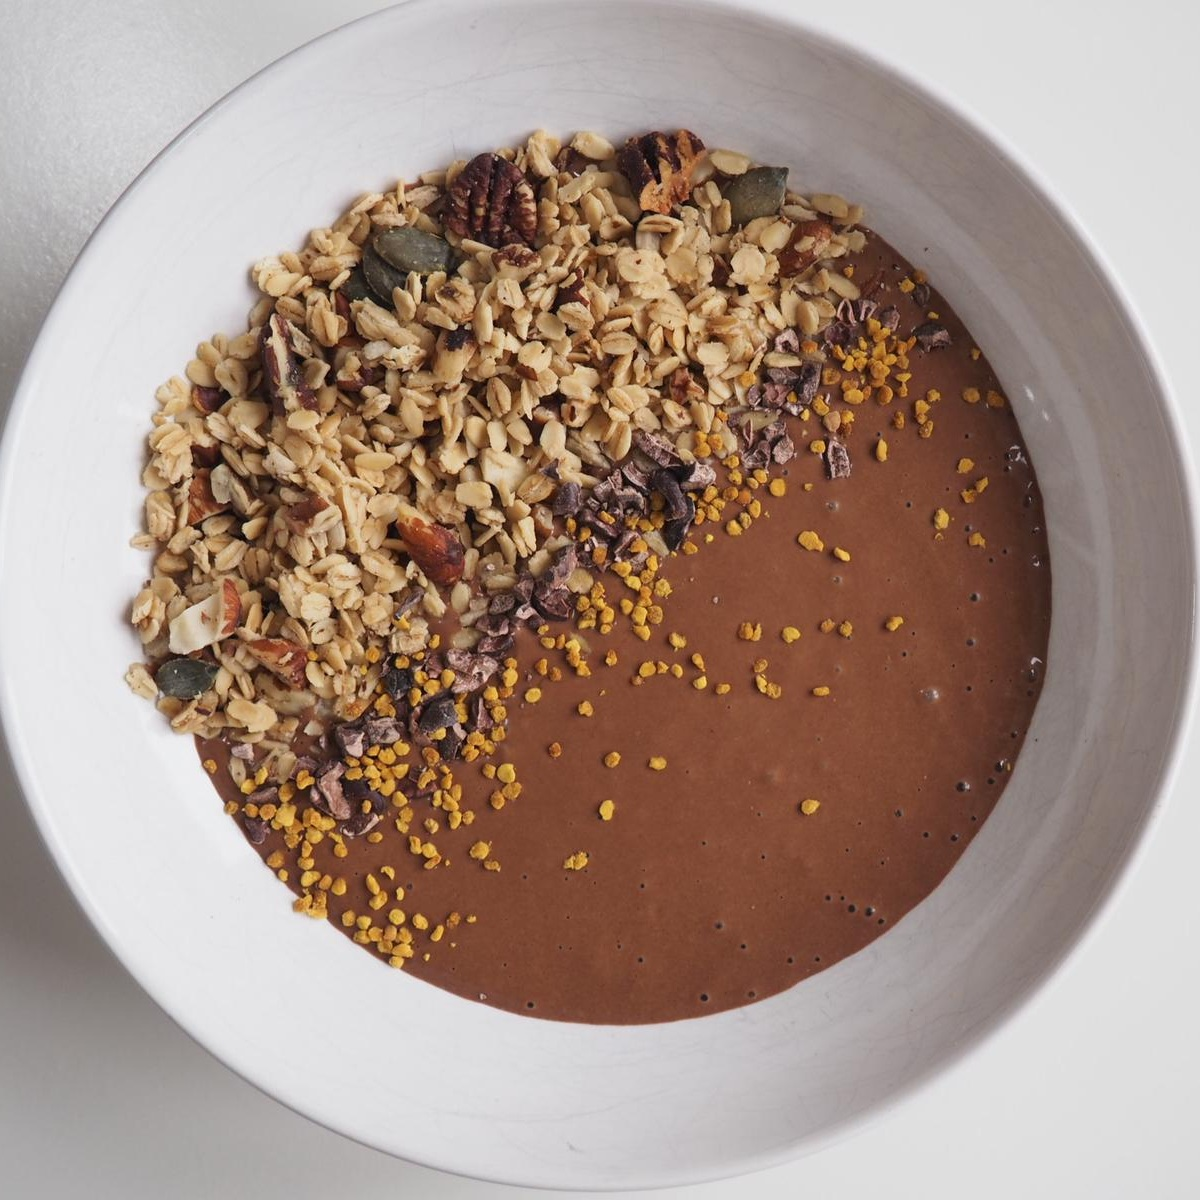 Chocolate, peanut butter and banana 2.jpeg